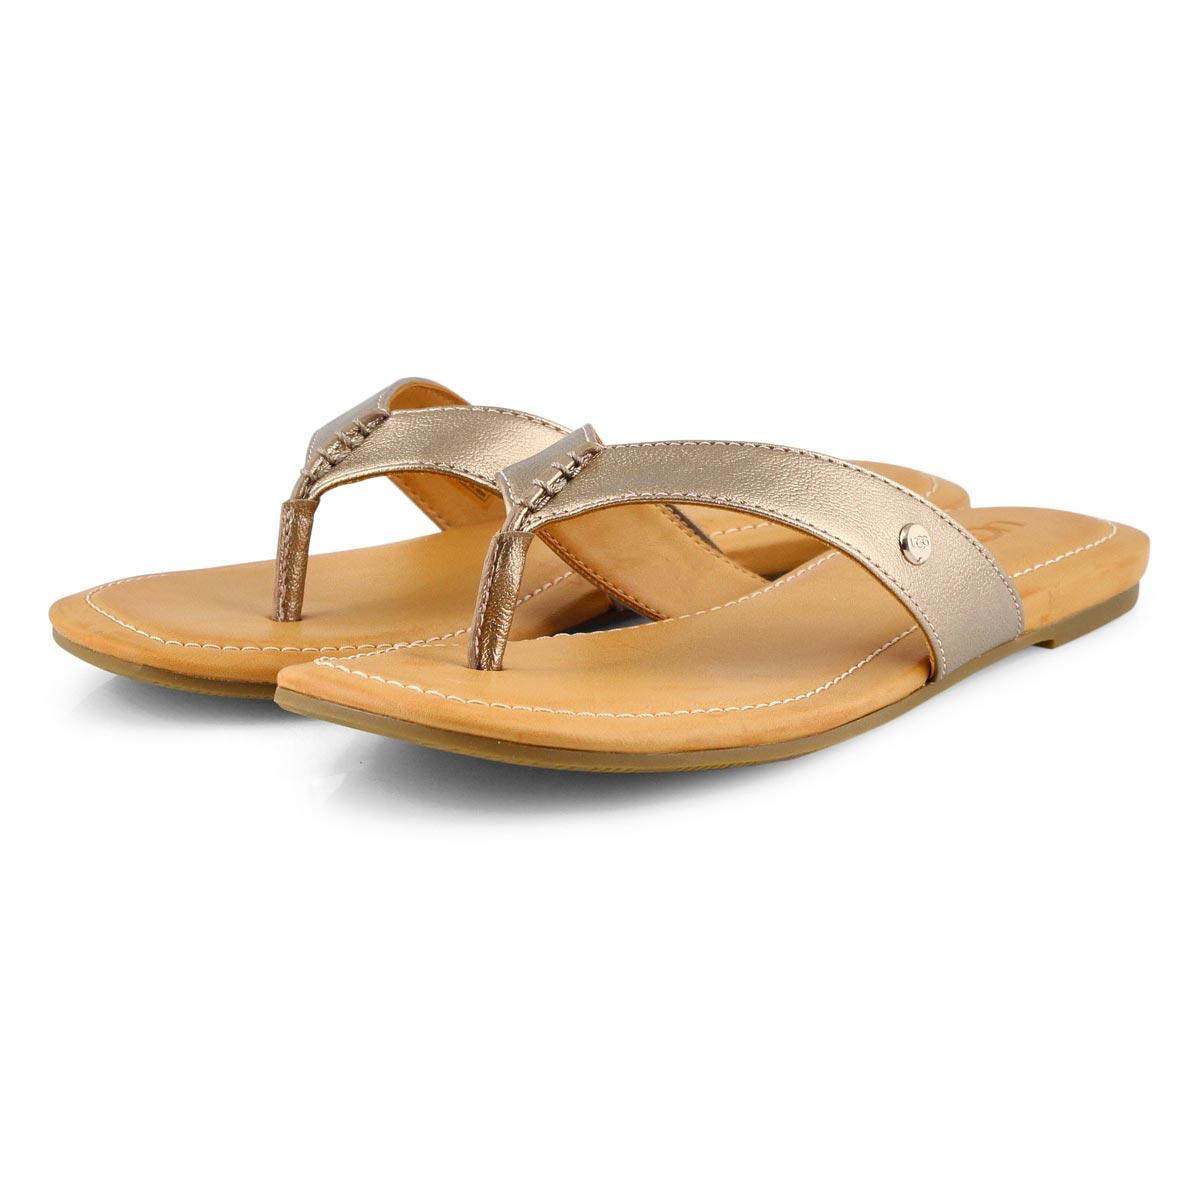 Sandale,Tuolumne,bronze,femme